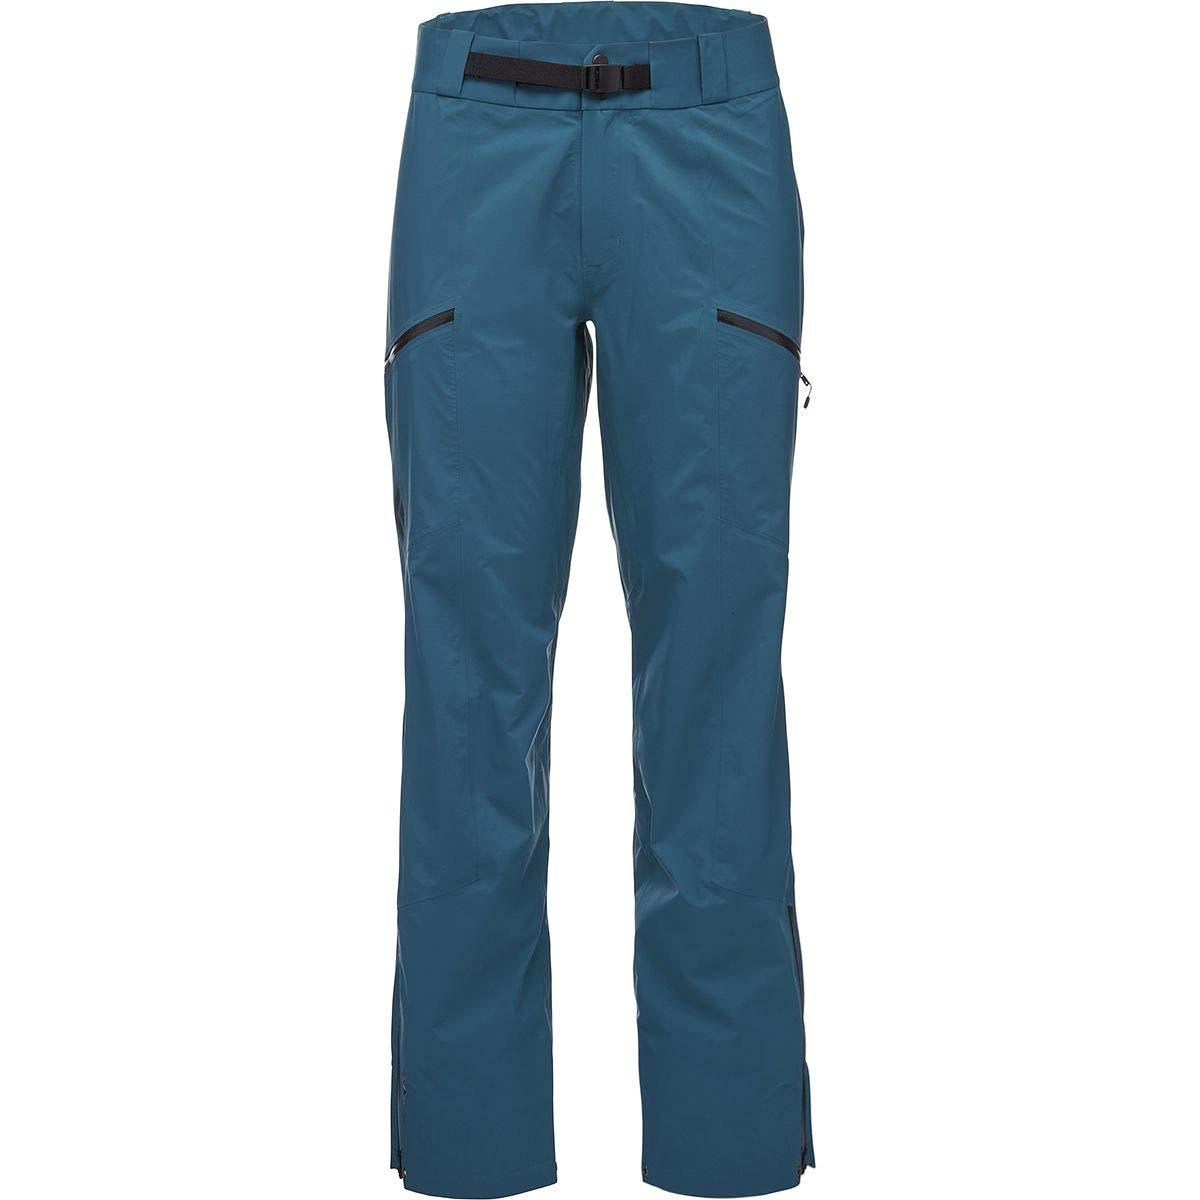 Black Diamond Helio Active Pants - Midnight